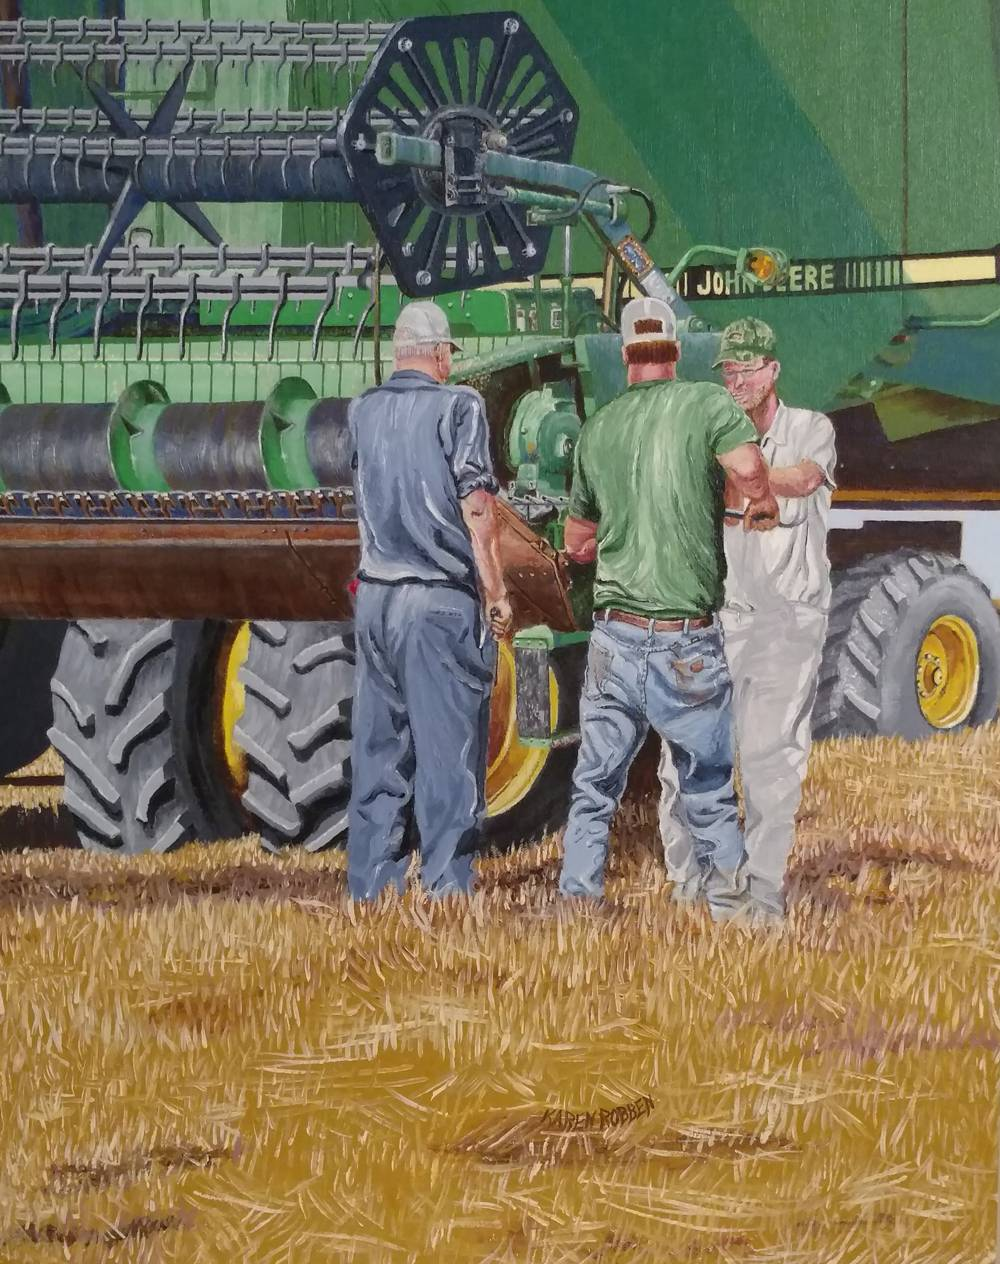 farm, harvest, combine, equipment, crop, wheat, tractor